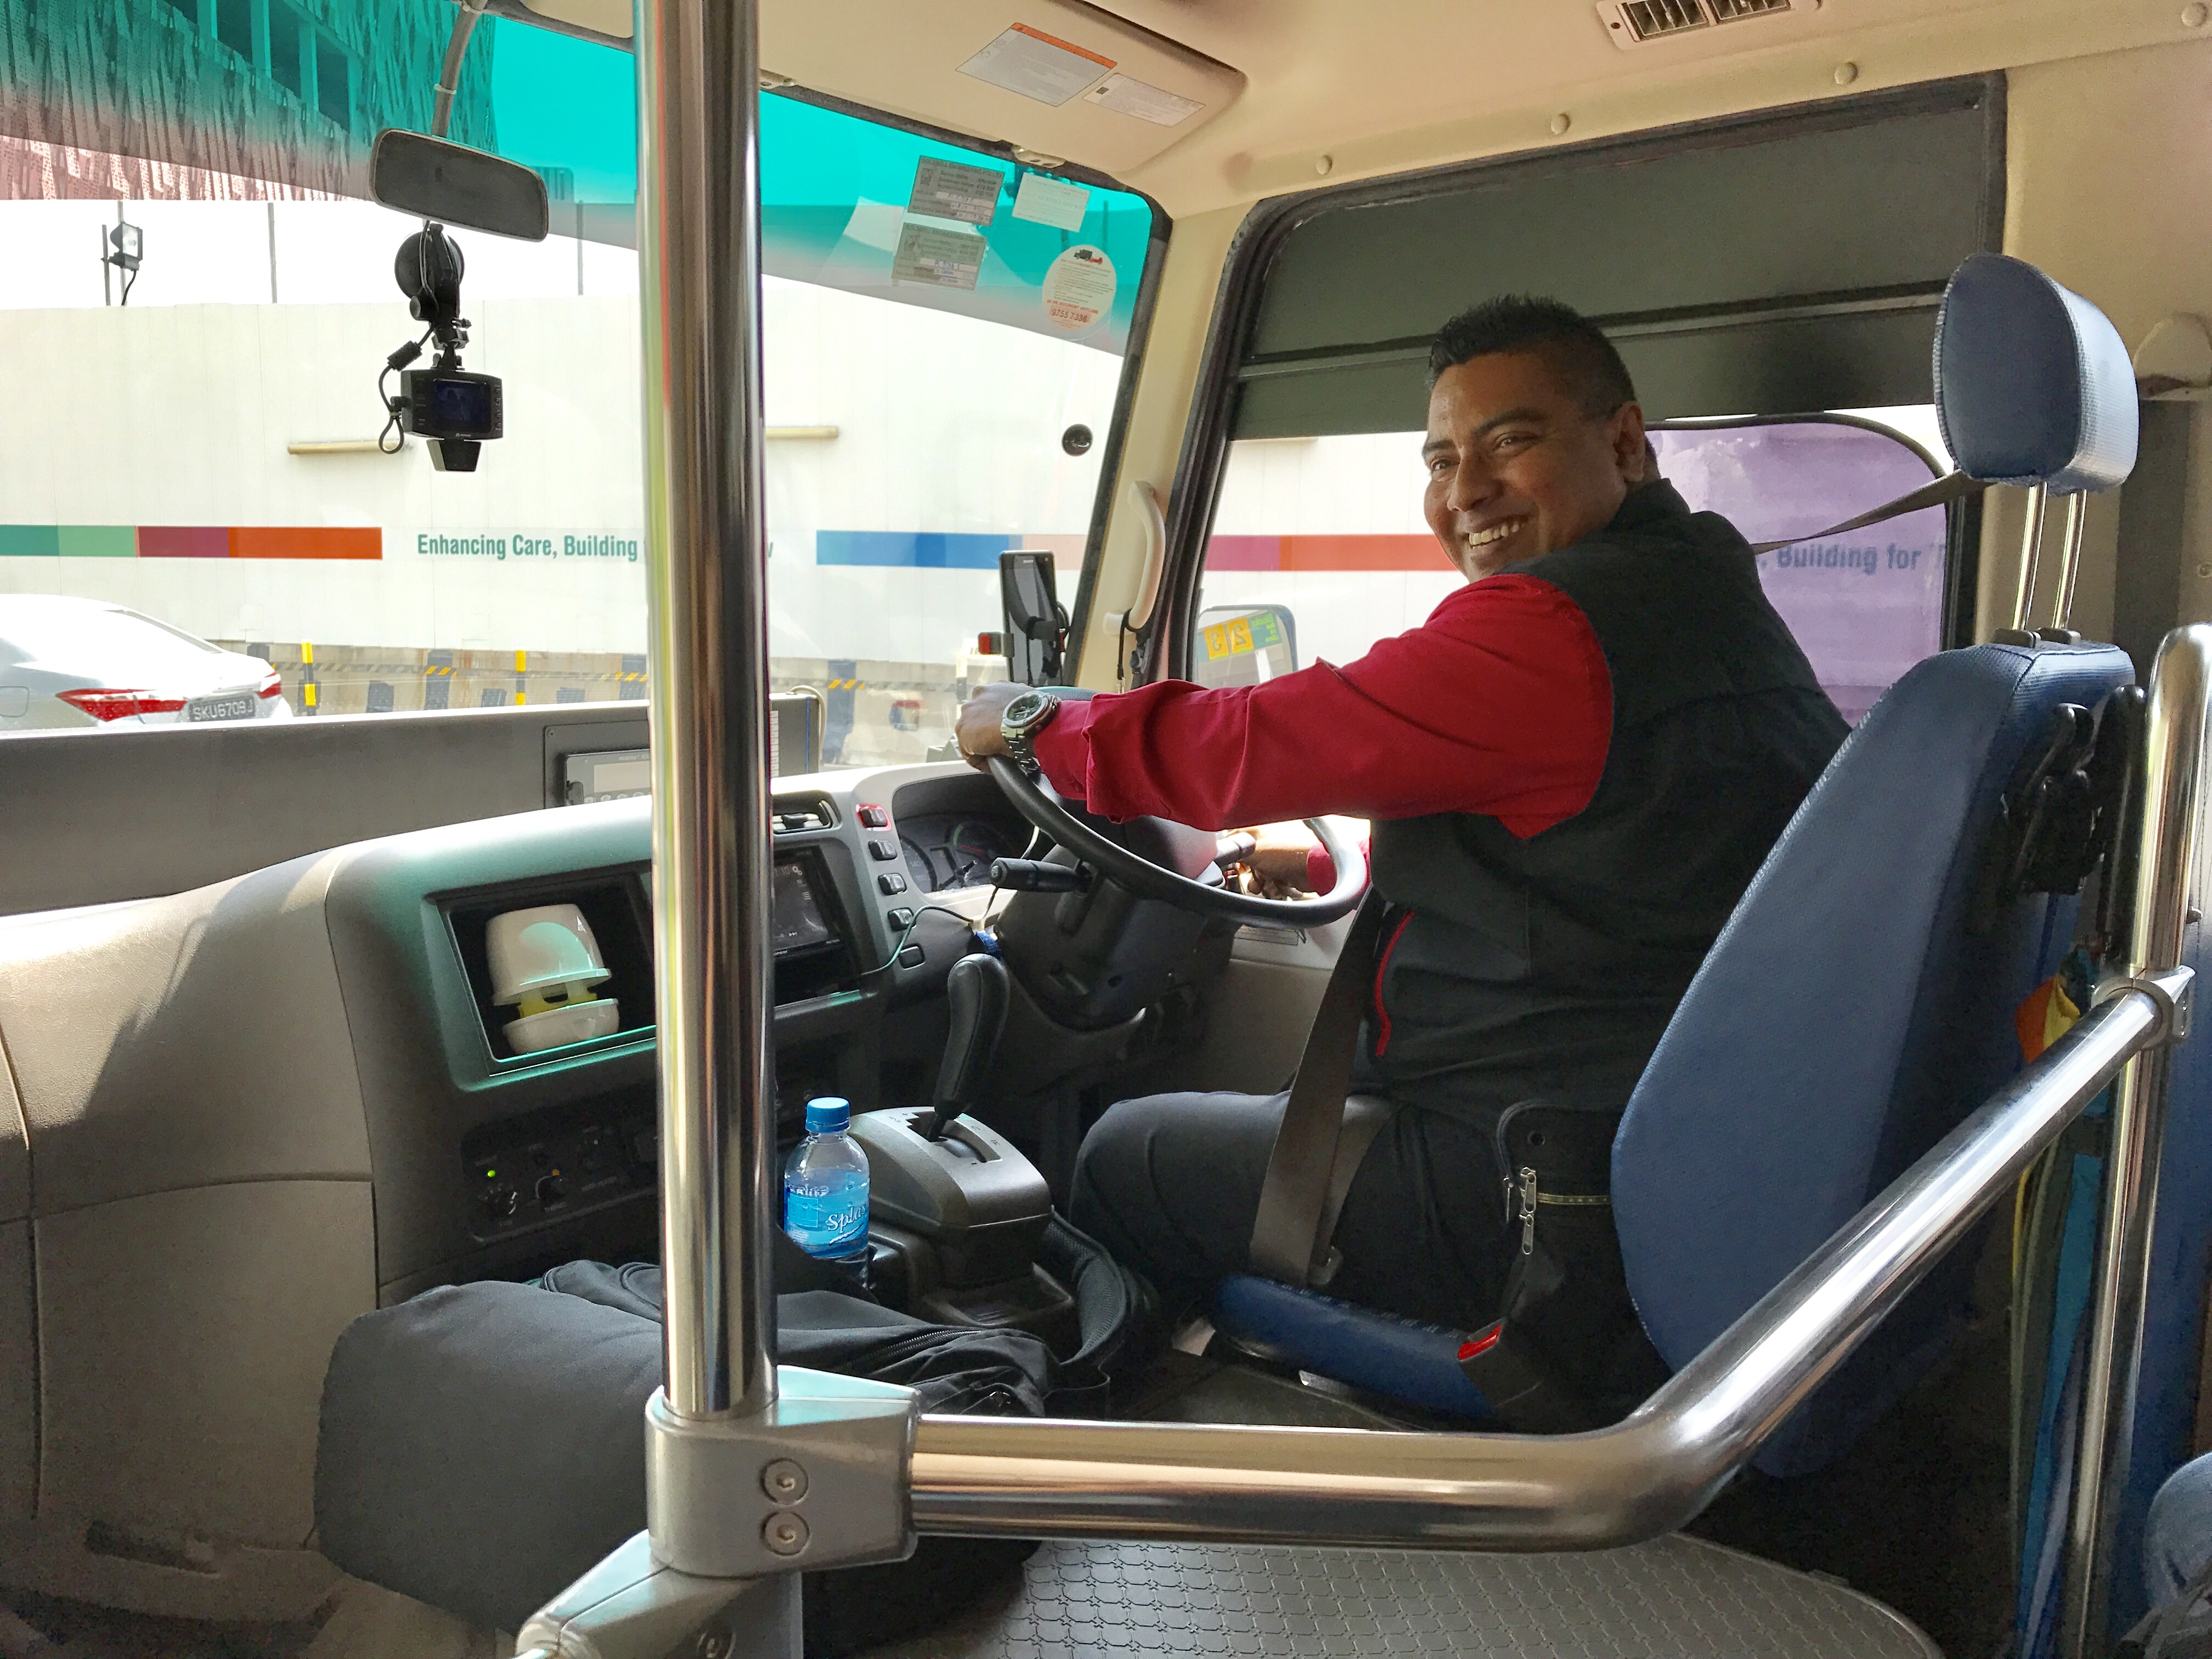 Feroz Bin Abdul Rahman has been a shuttle bus driver with SingHealth for more than 4 years.